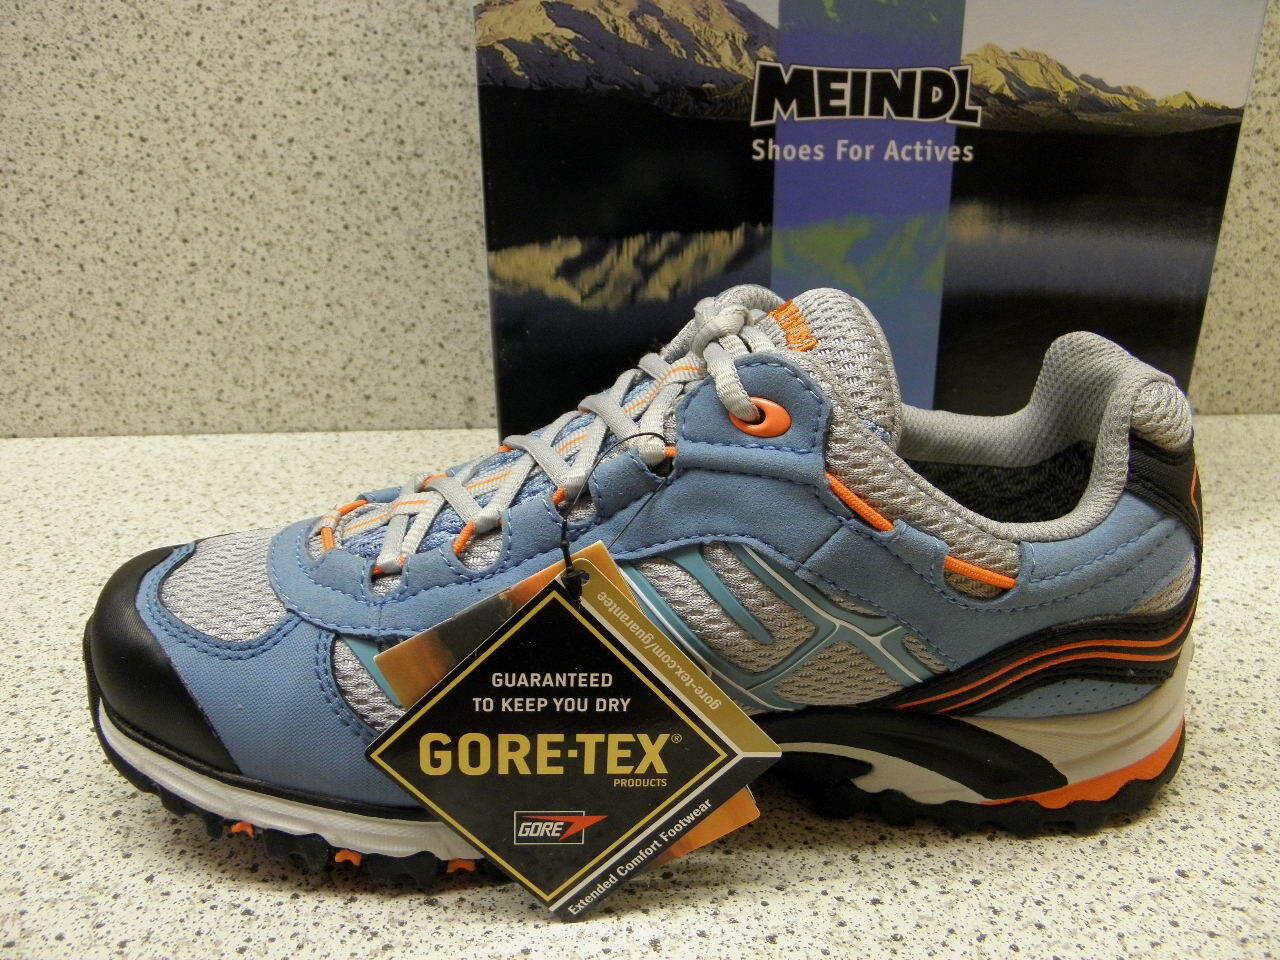 MEINDL ® bisher   Cuba Lady GTX®  GORE-TEX®  Art. 3017 18 (M83)